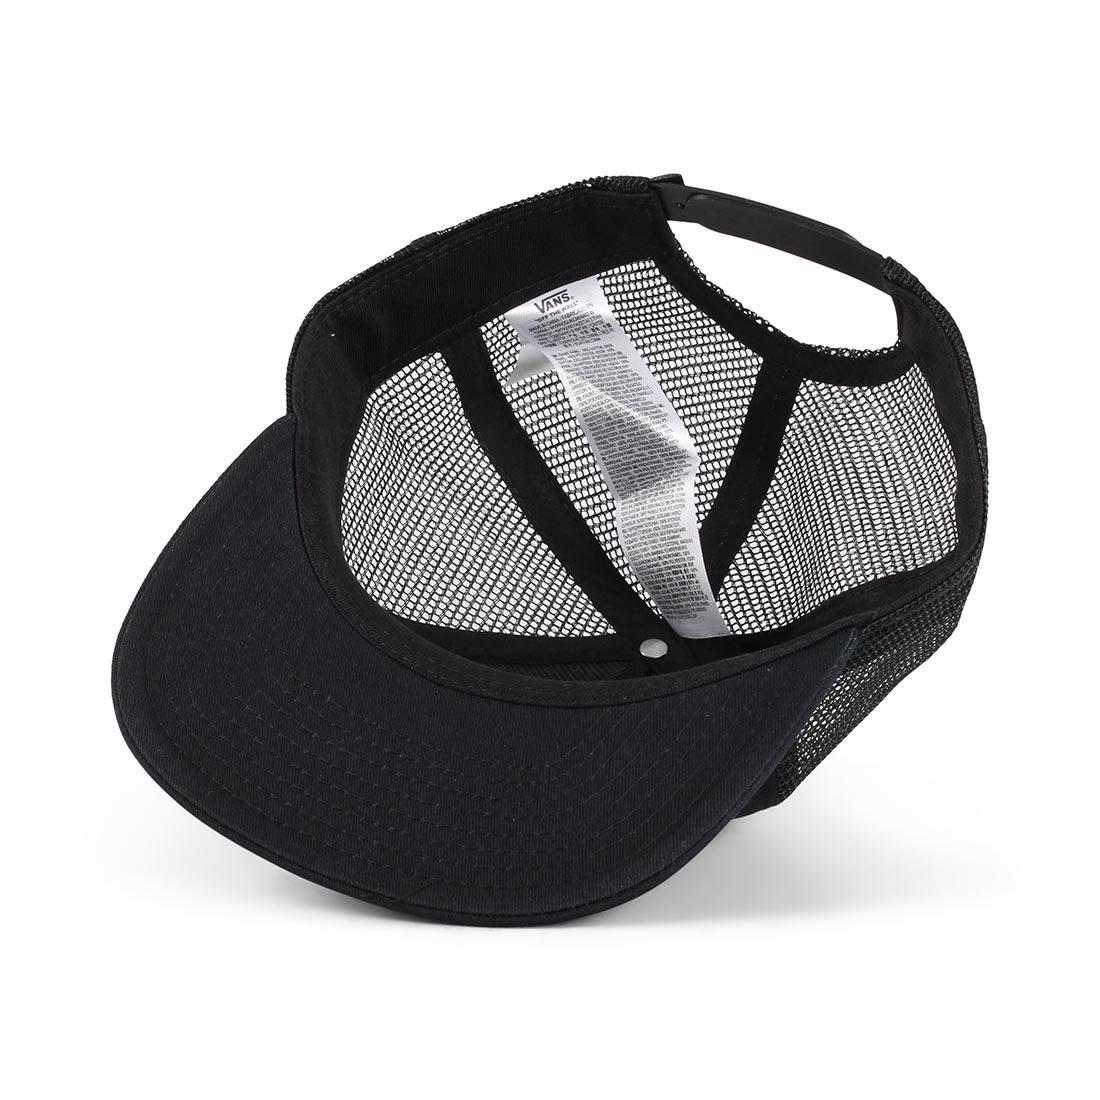 Vans x Anti Hero Wired Trucker Hat - Black